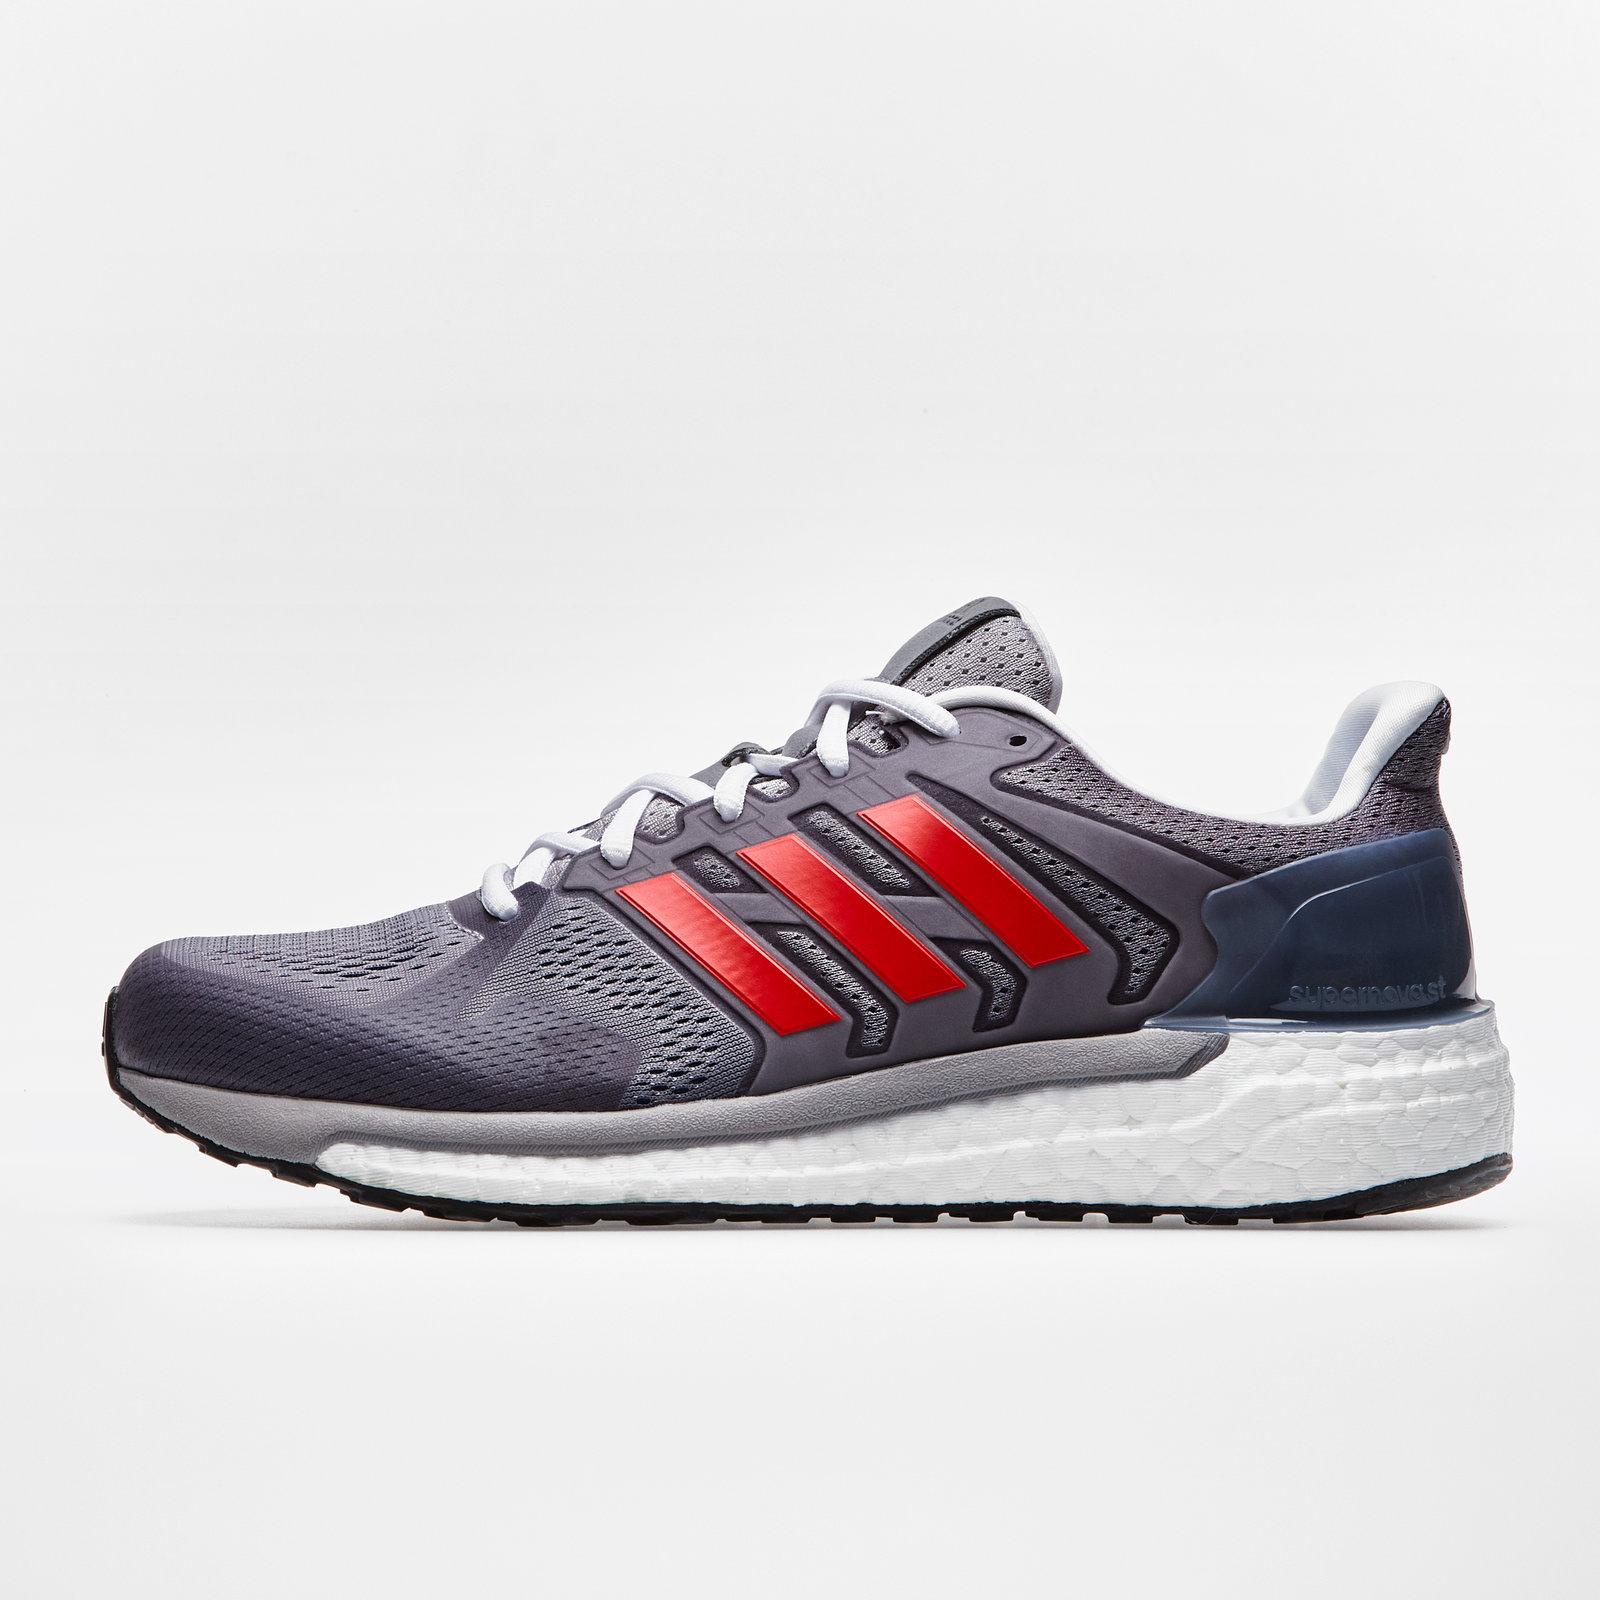 6b5d45bac6cf0 adidas Mens Supernova ST AKTIV Running Shoes Footwear Sports Trainers Grey